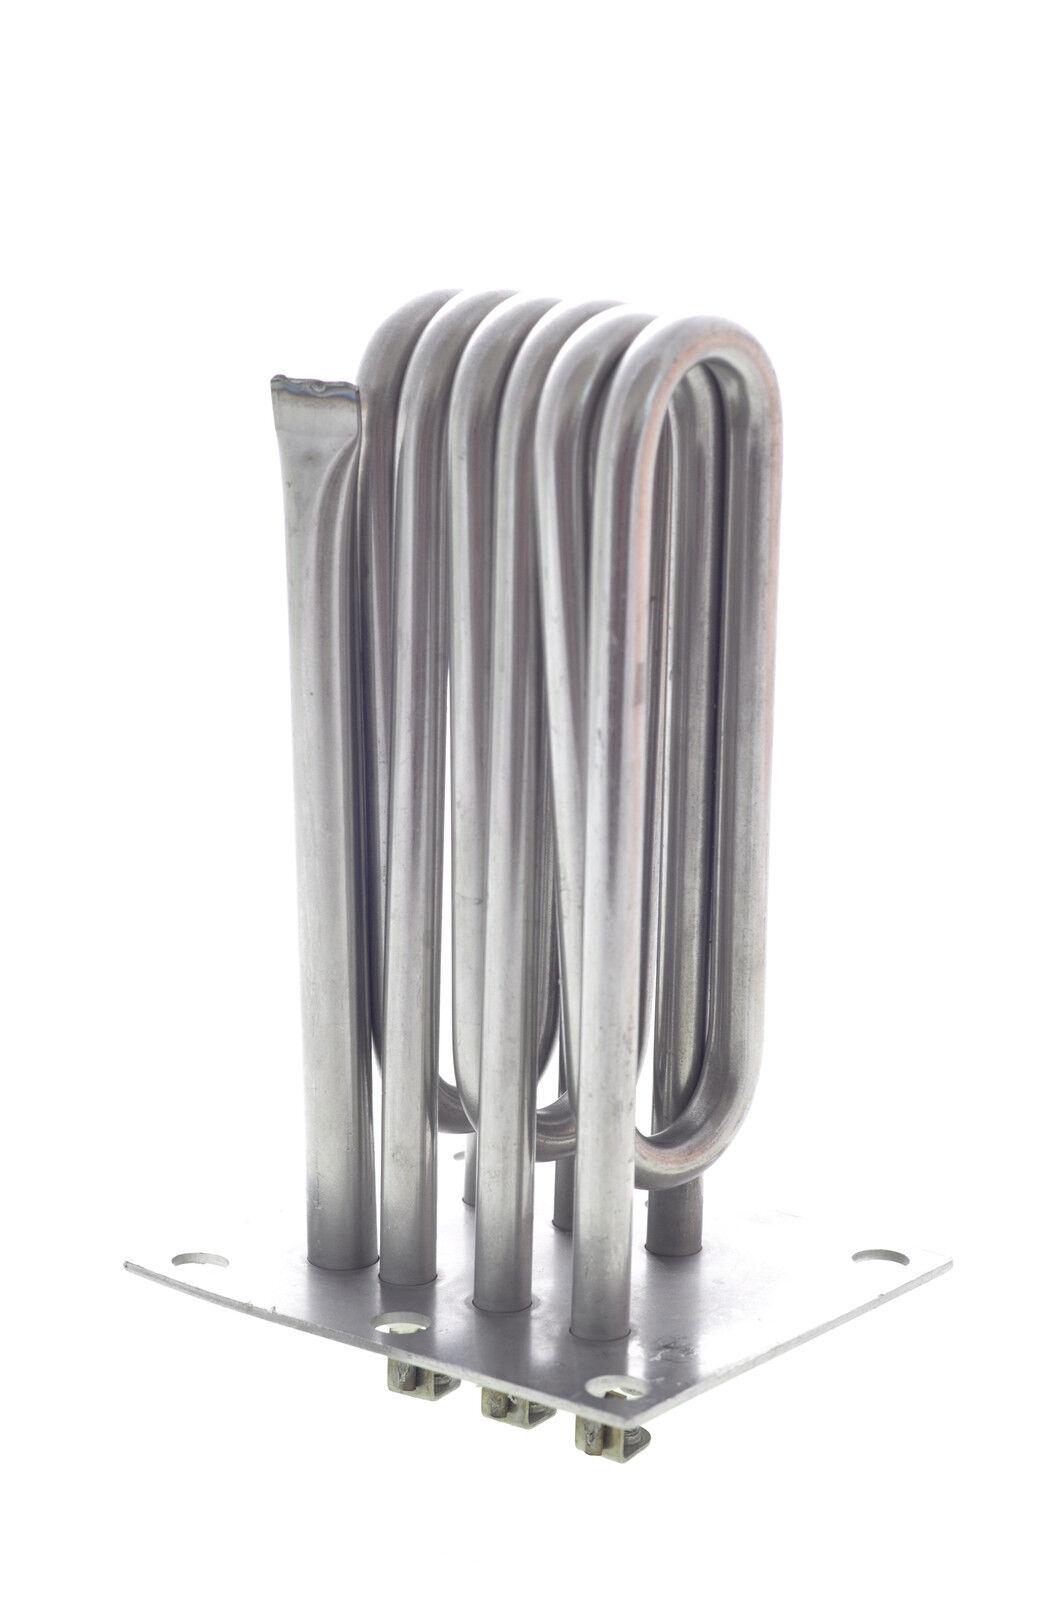 Spirale Riscaldata per Generatore Vapore 6 Kw Doccia a Sauna Bagno